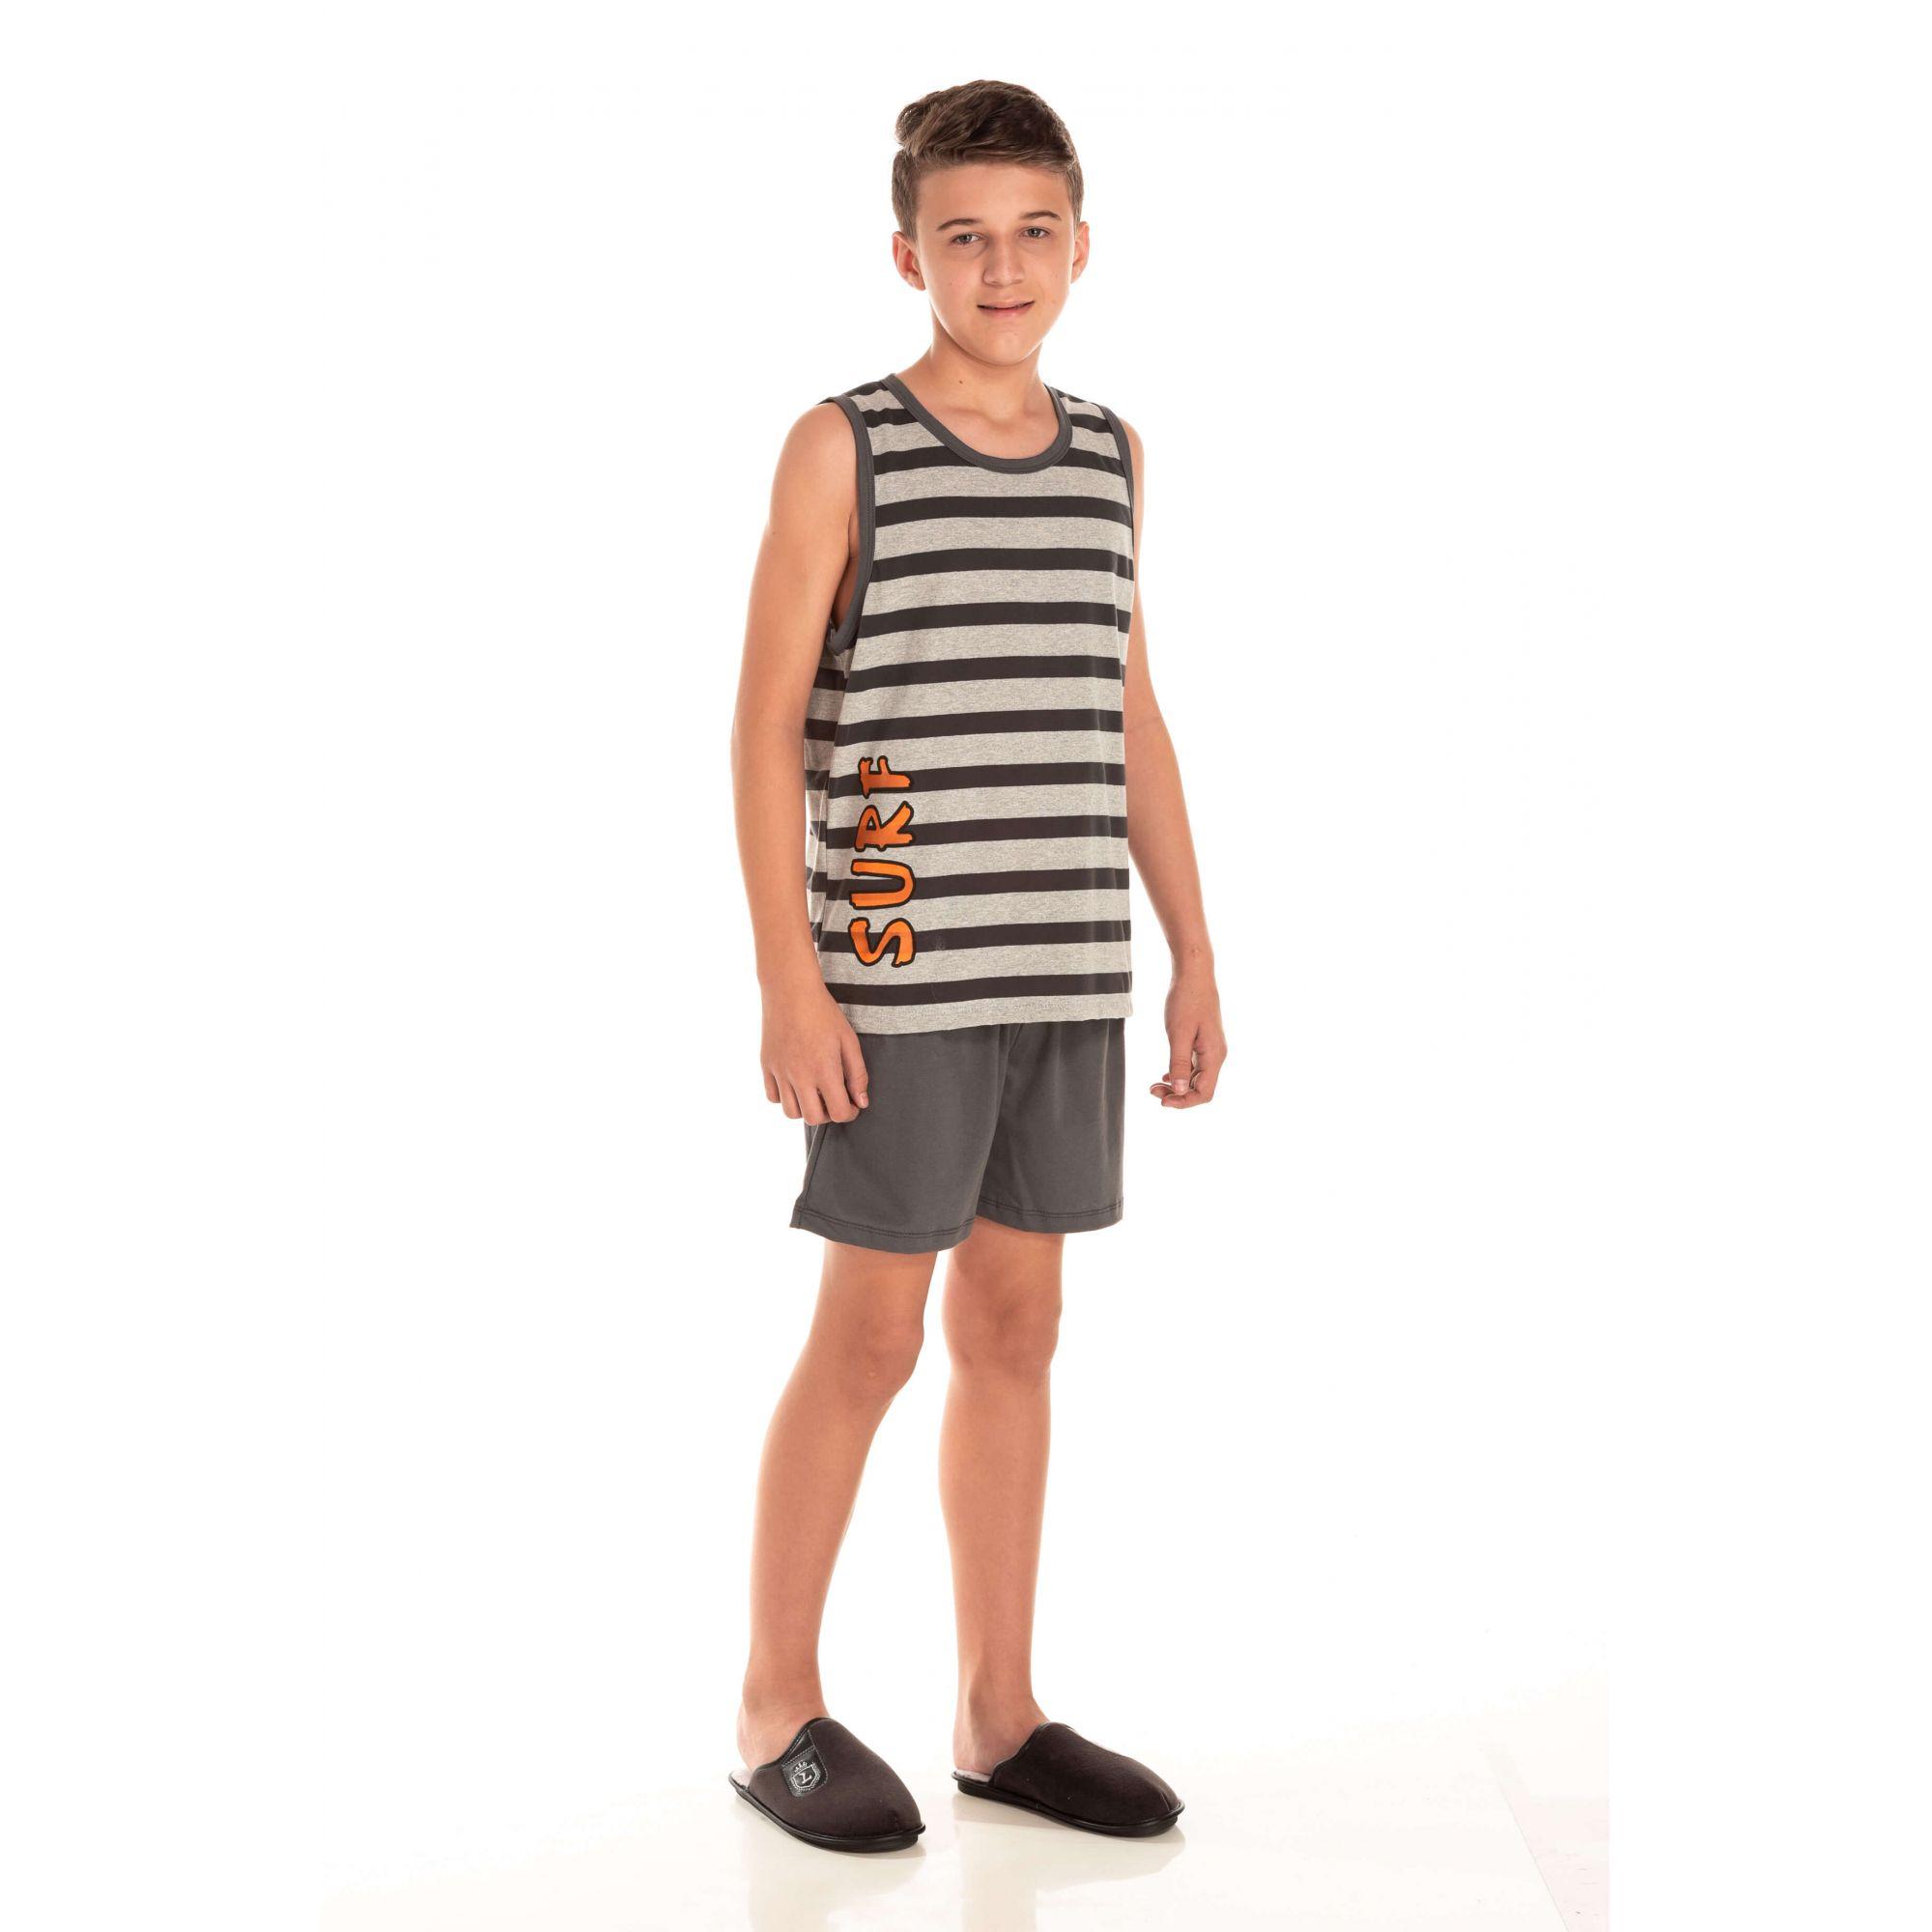 Pijama Juvenil Masculino Surf - Listrado Mescla